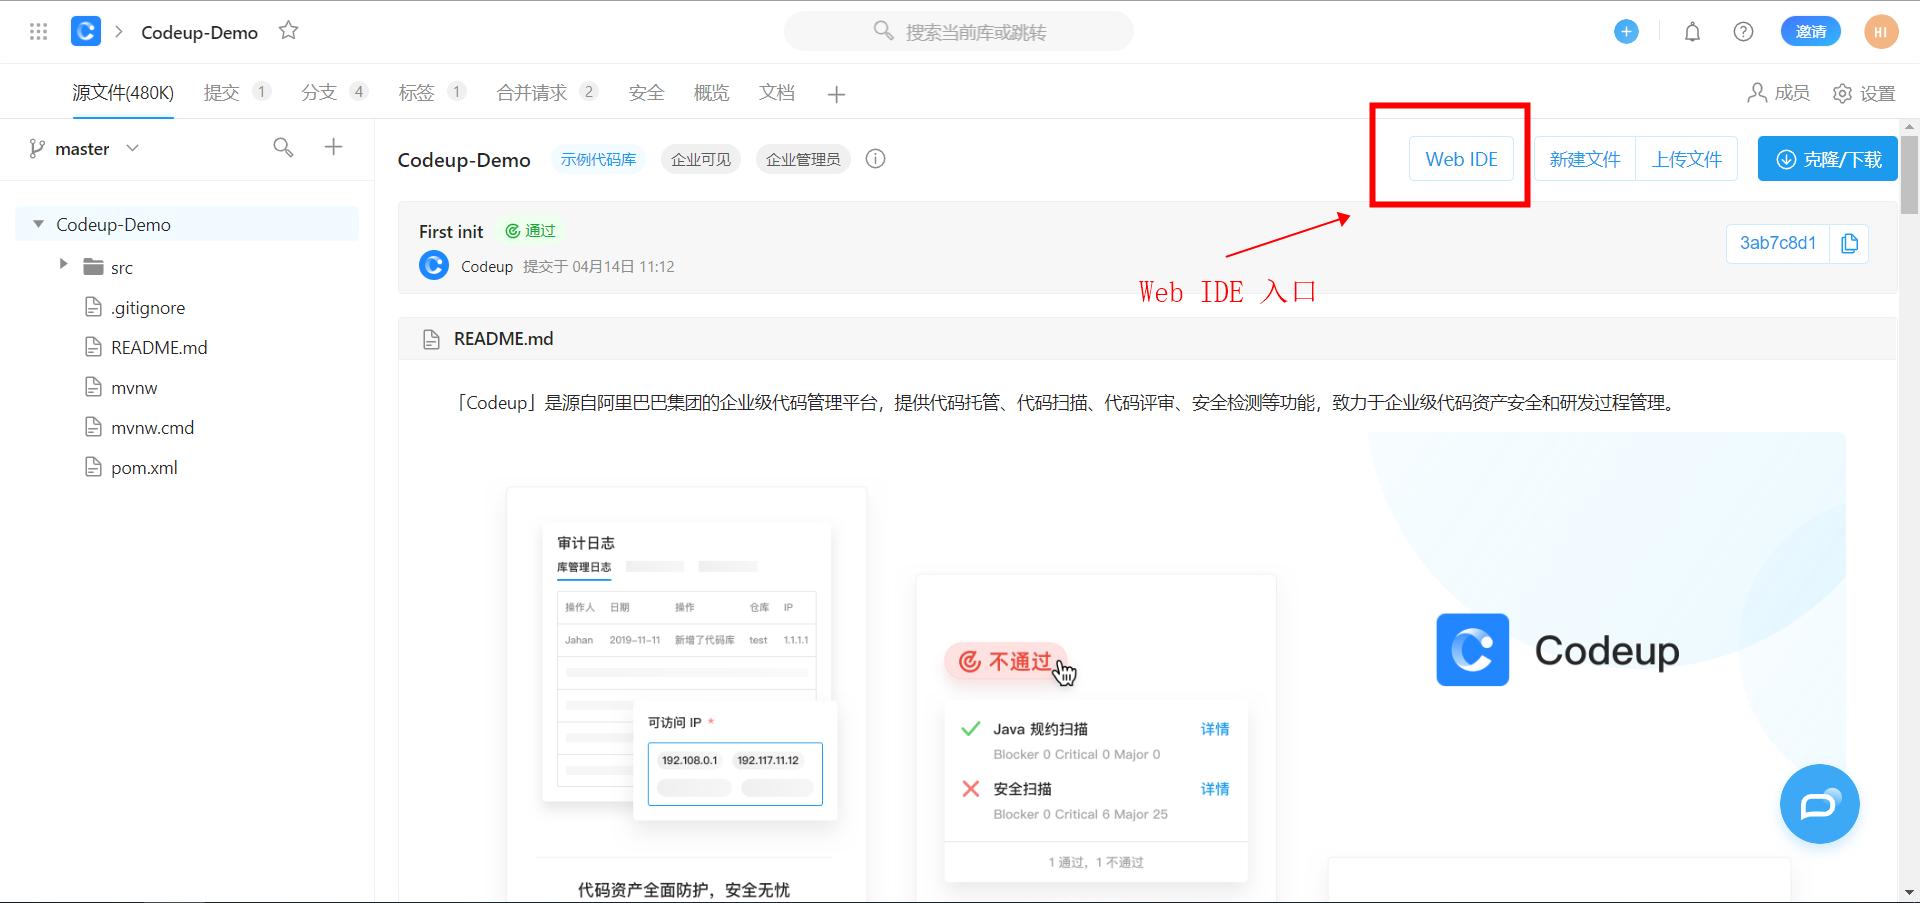 Web IDE 入口.png